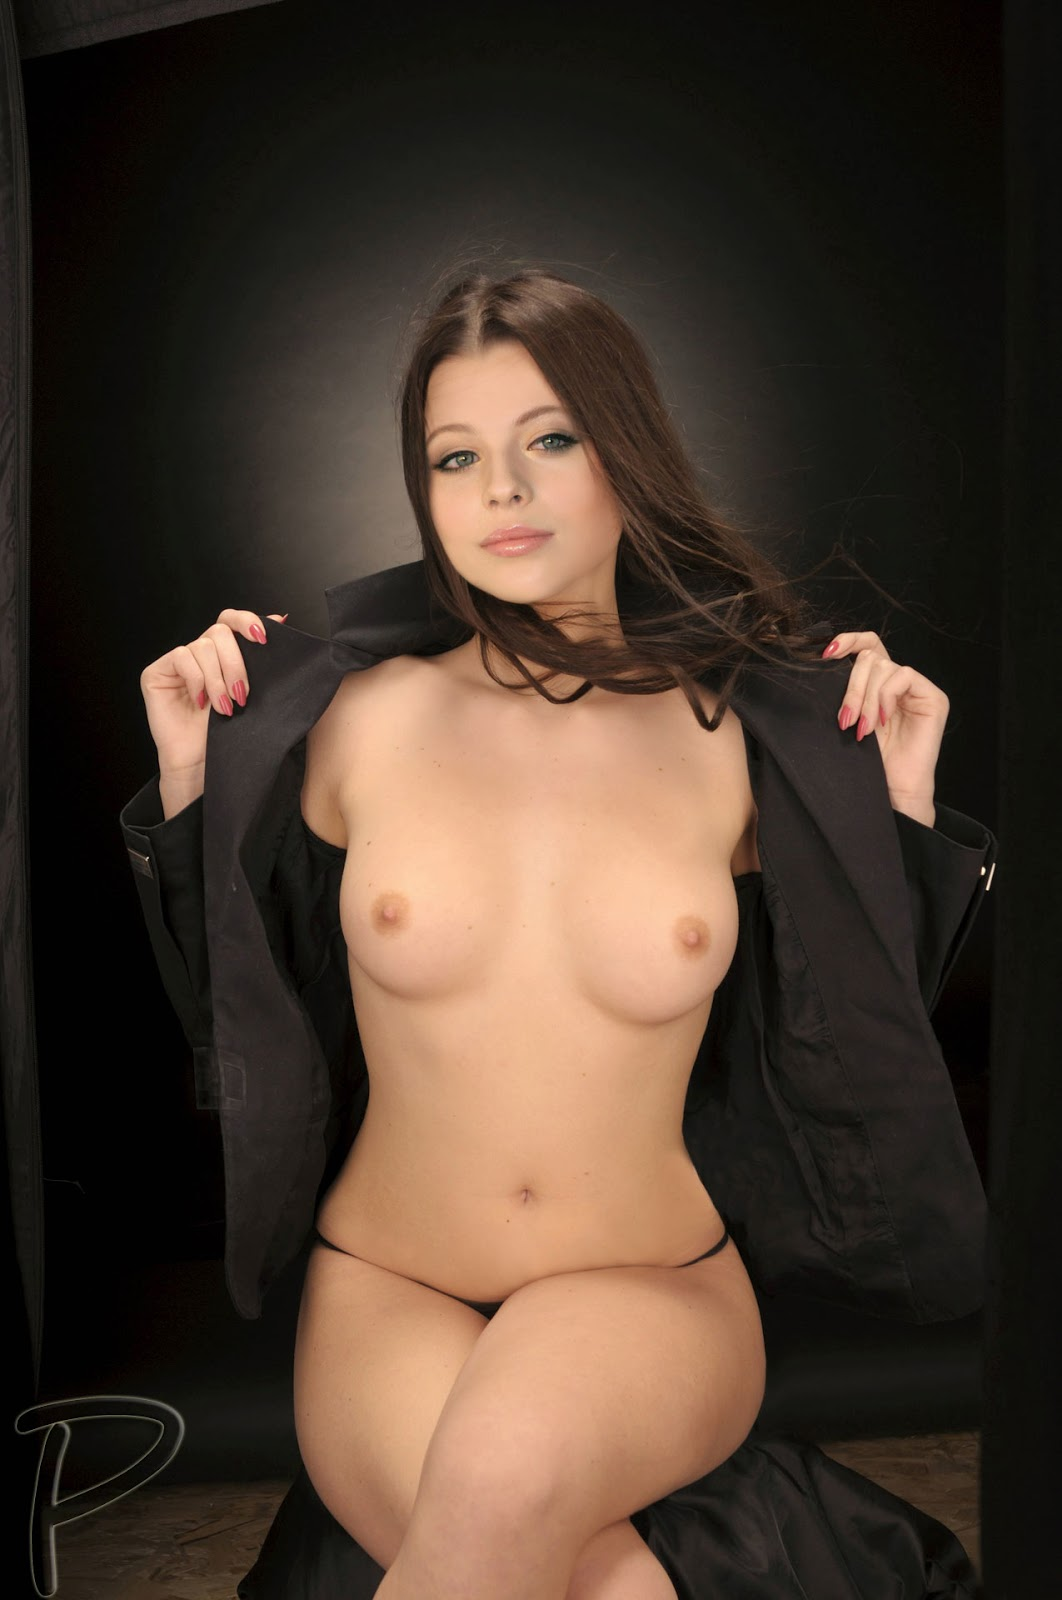 Bald headed asian women nude